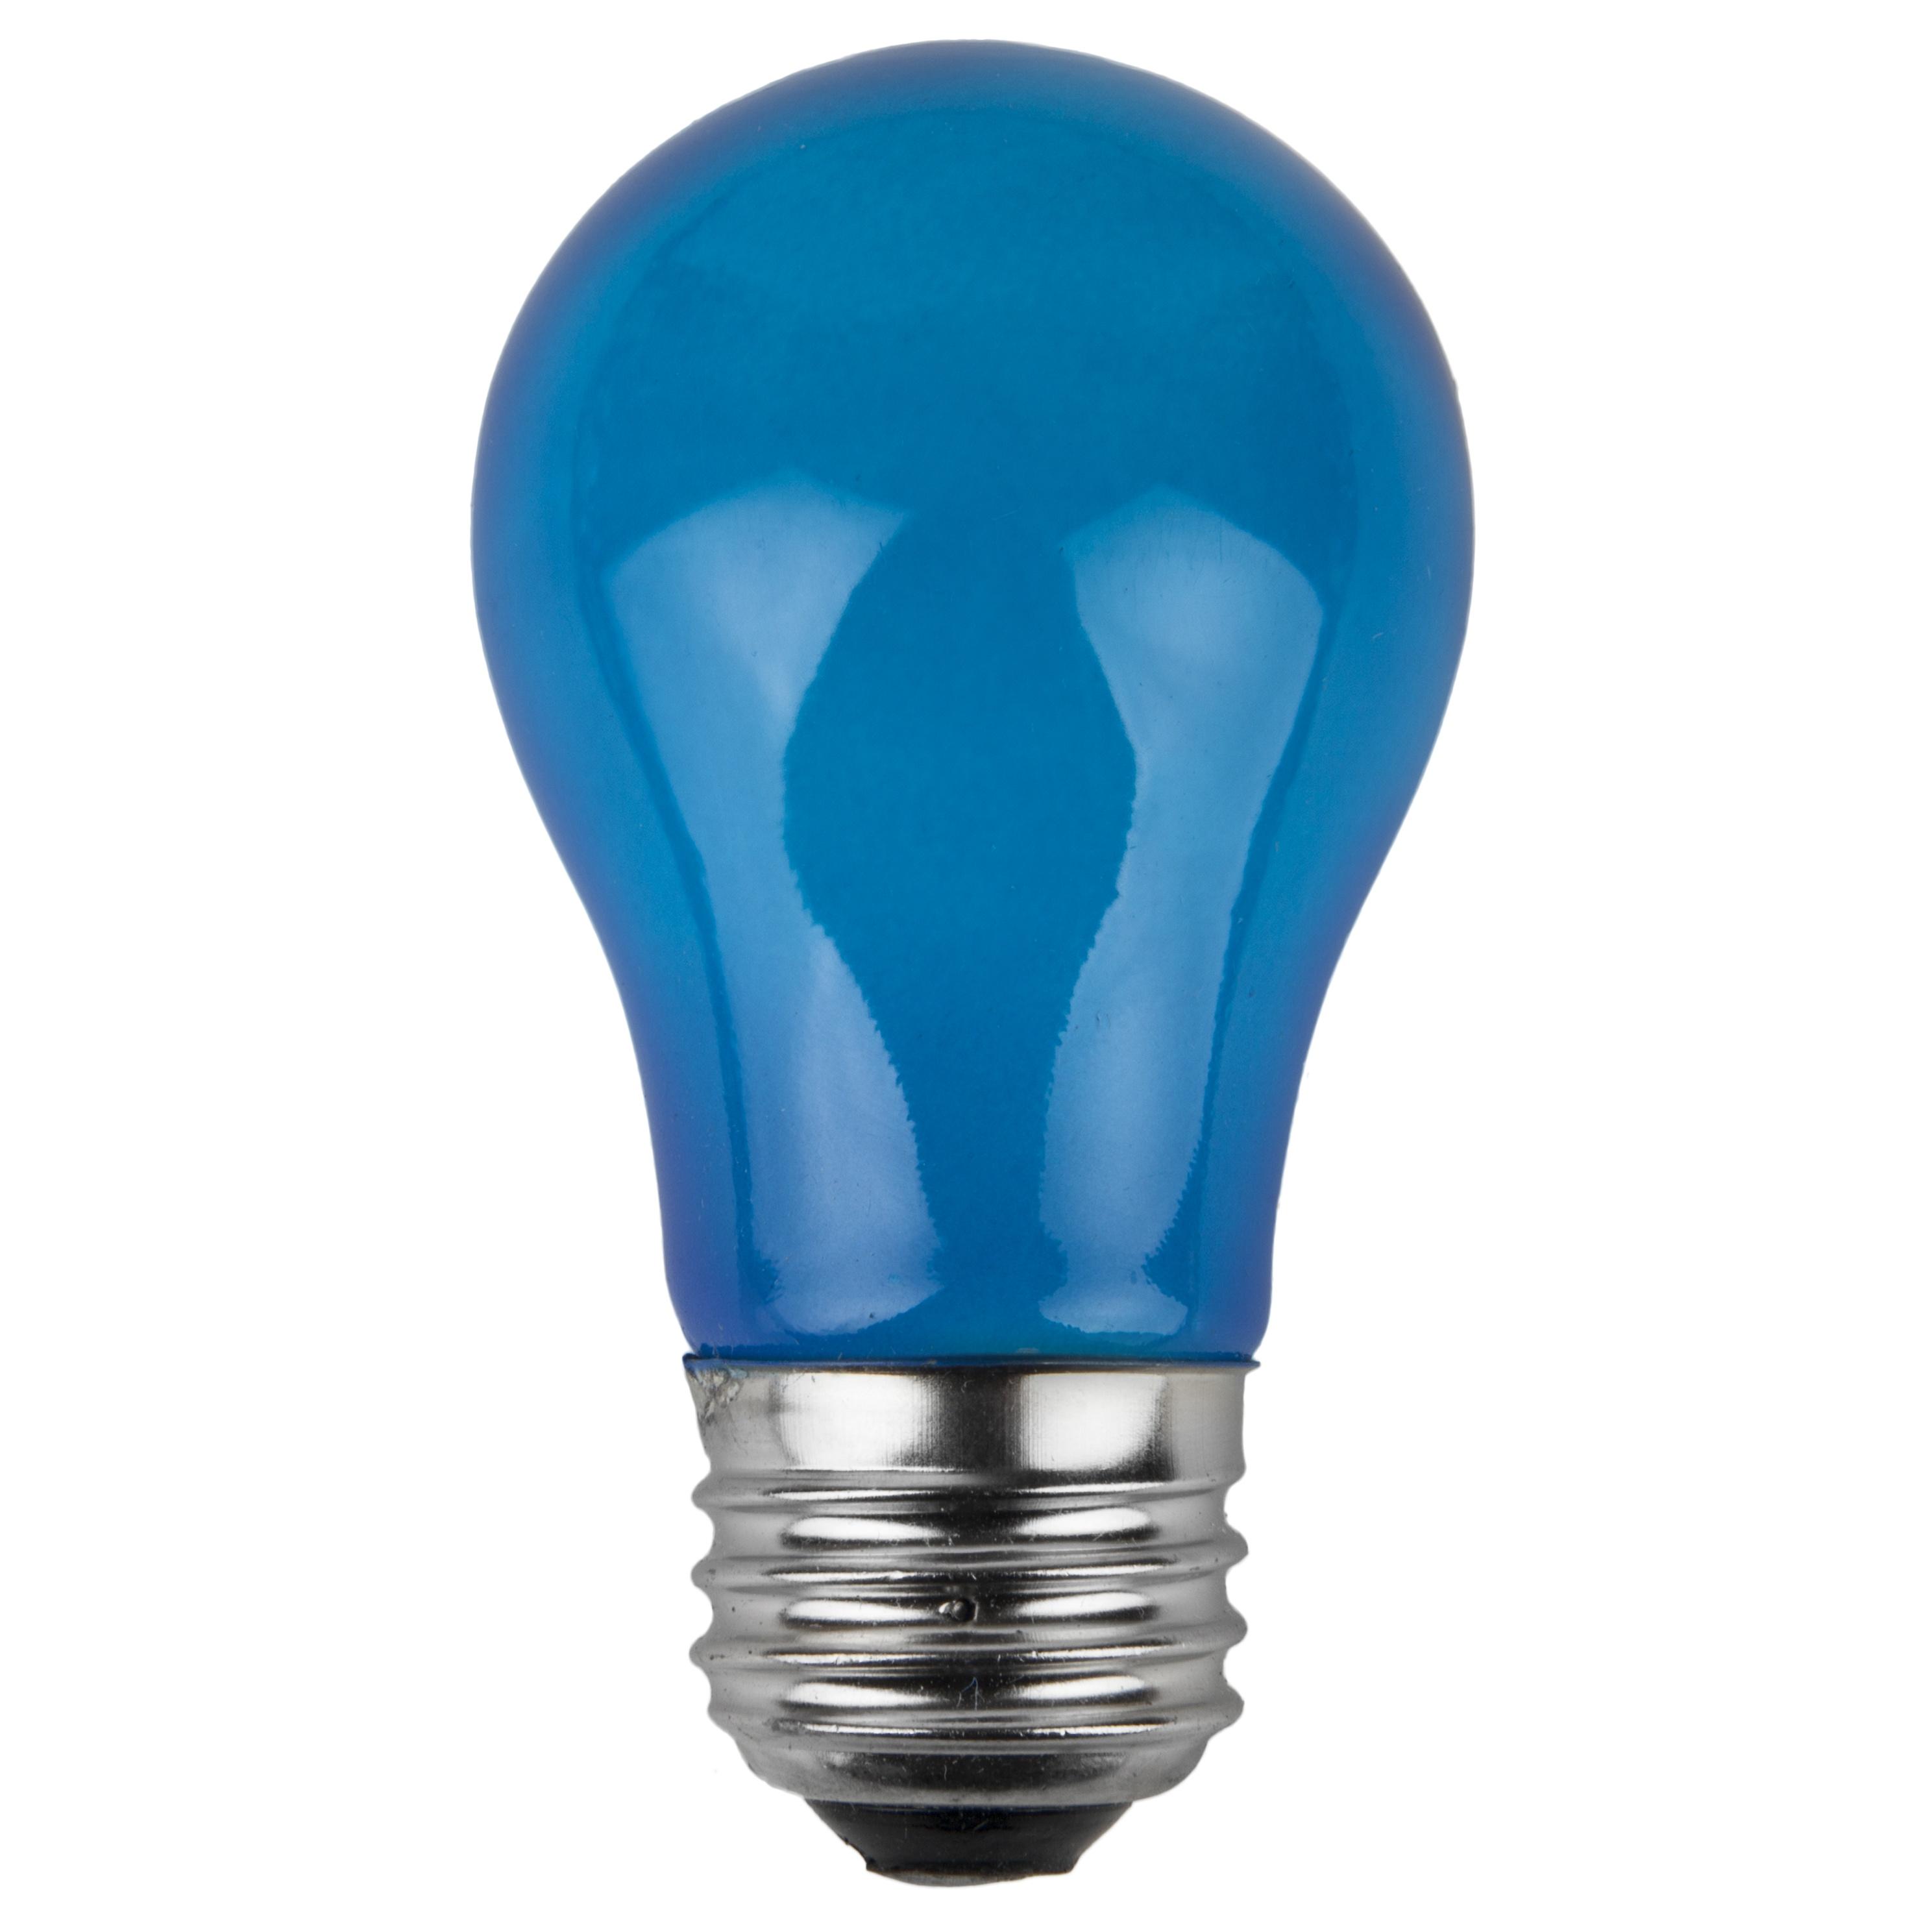 E26 Party And Sign Bulbs A15 Opaque Blue 15 Watt